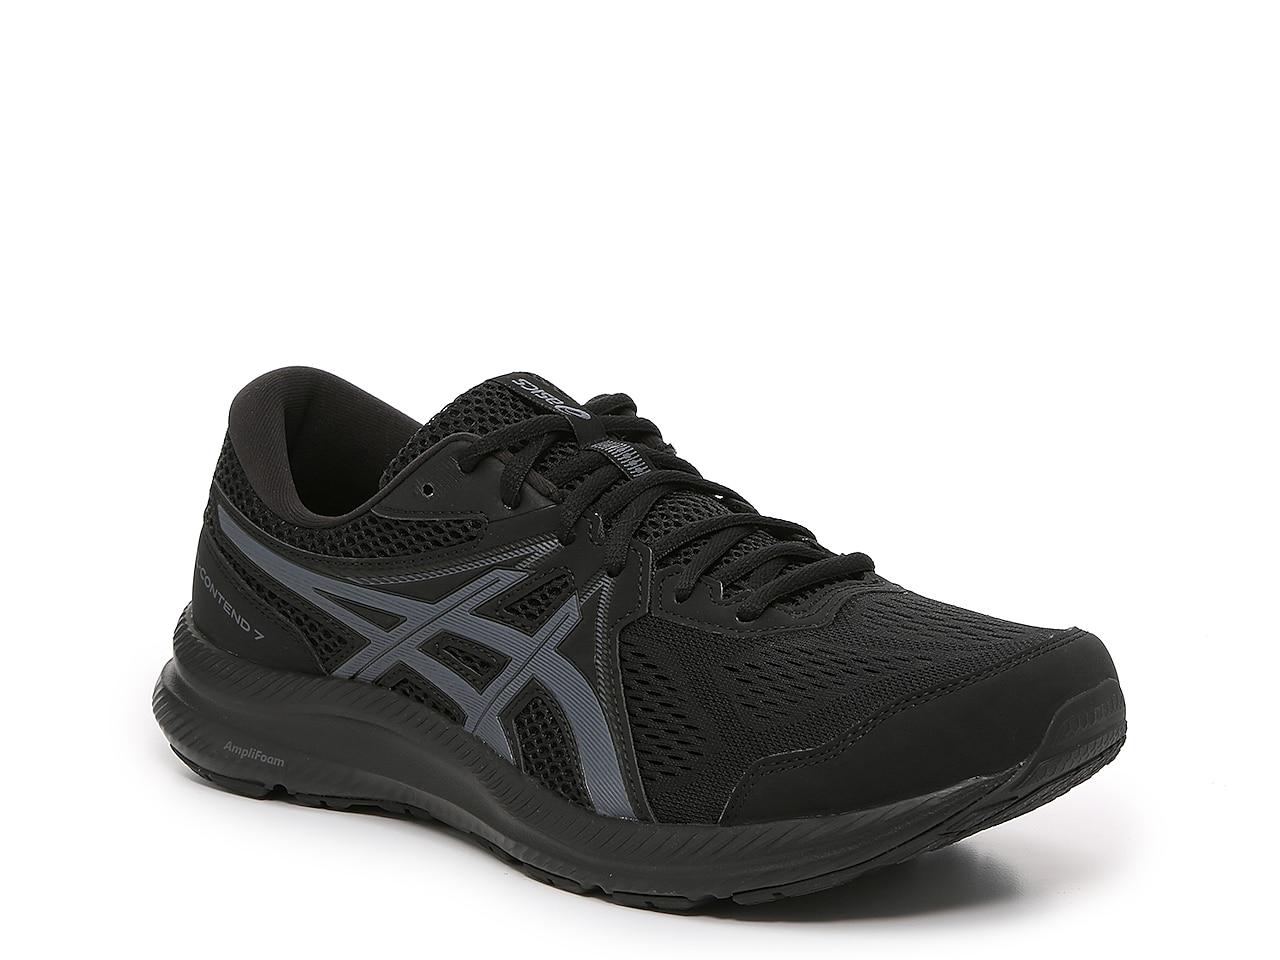 ASICS GEL-Contend 7 Running Shoe - Men's